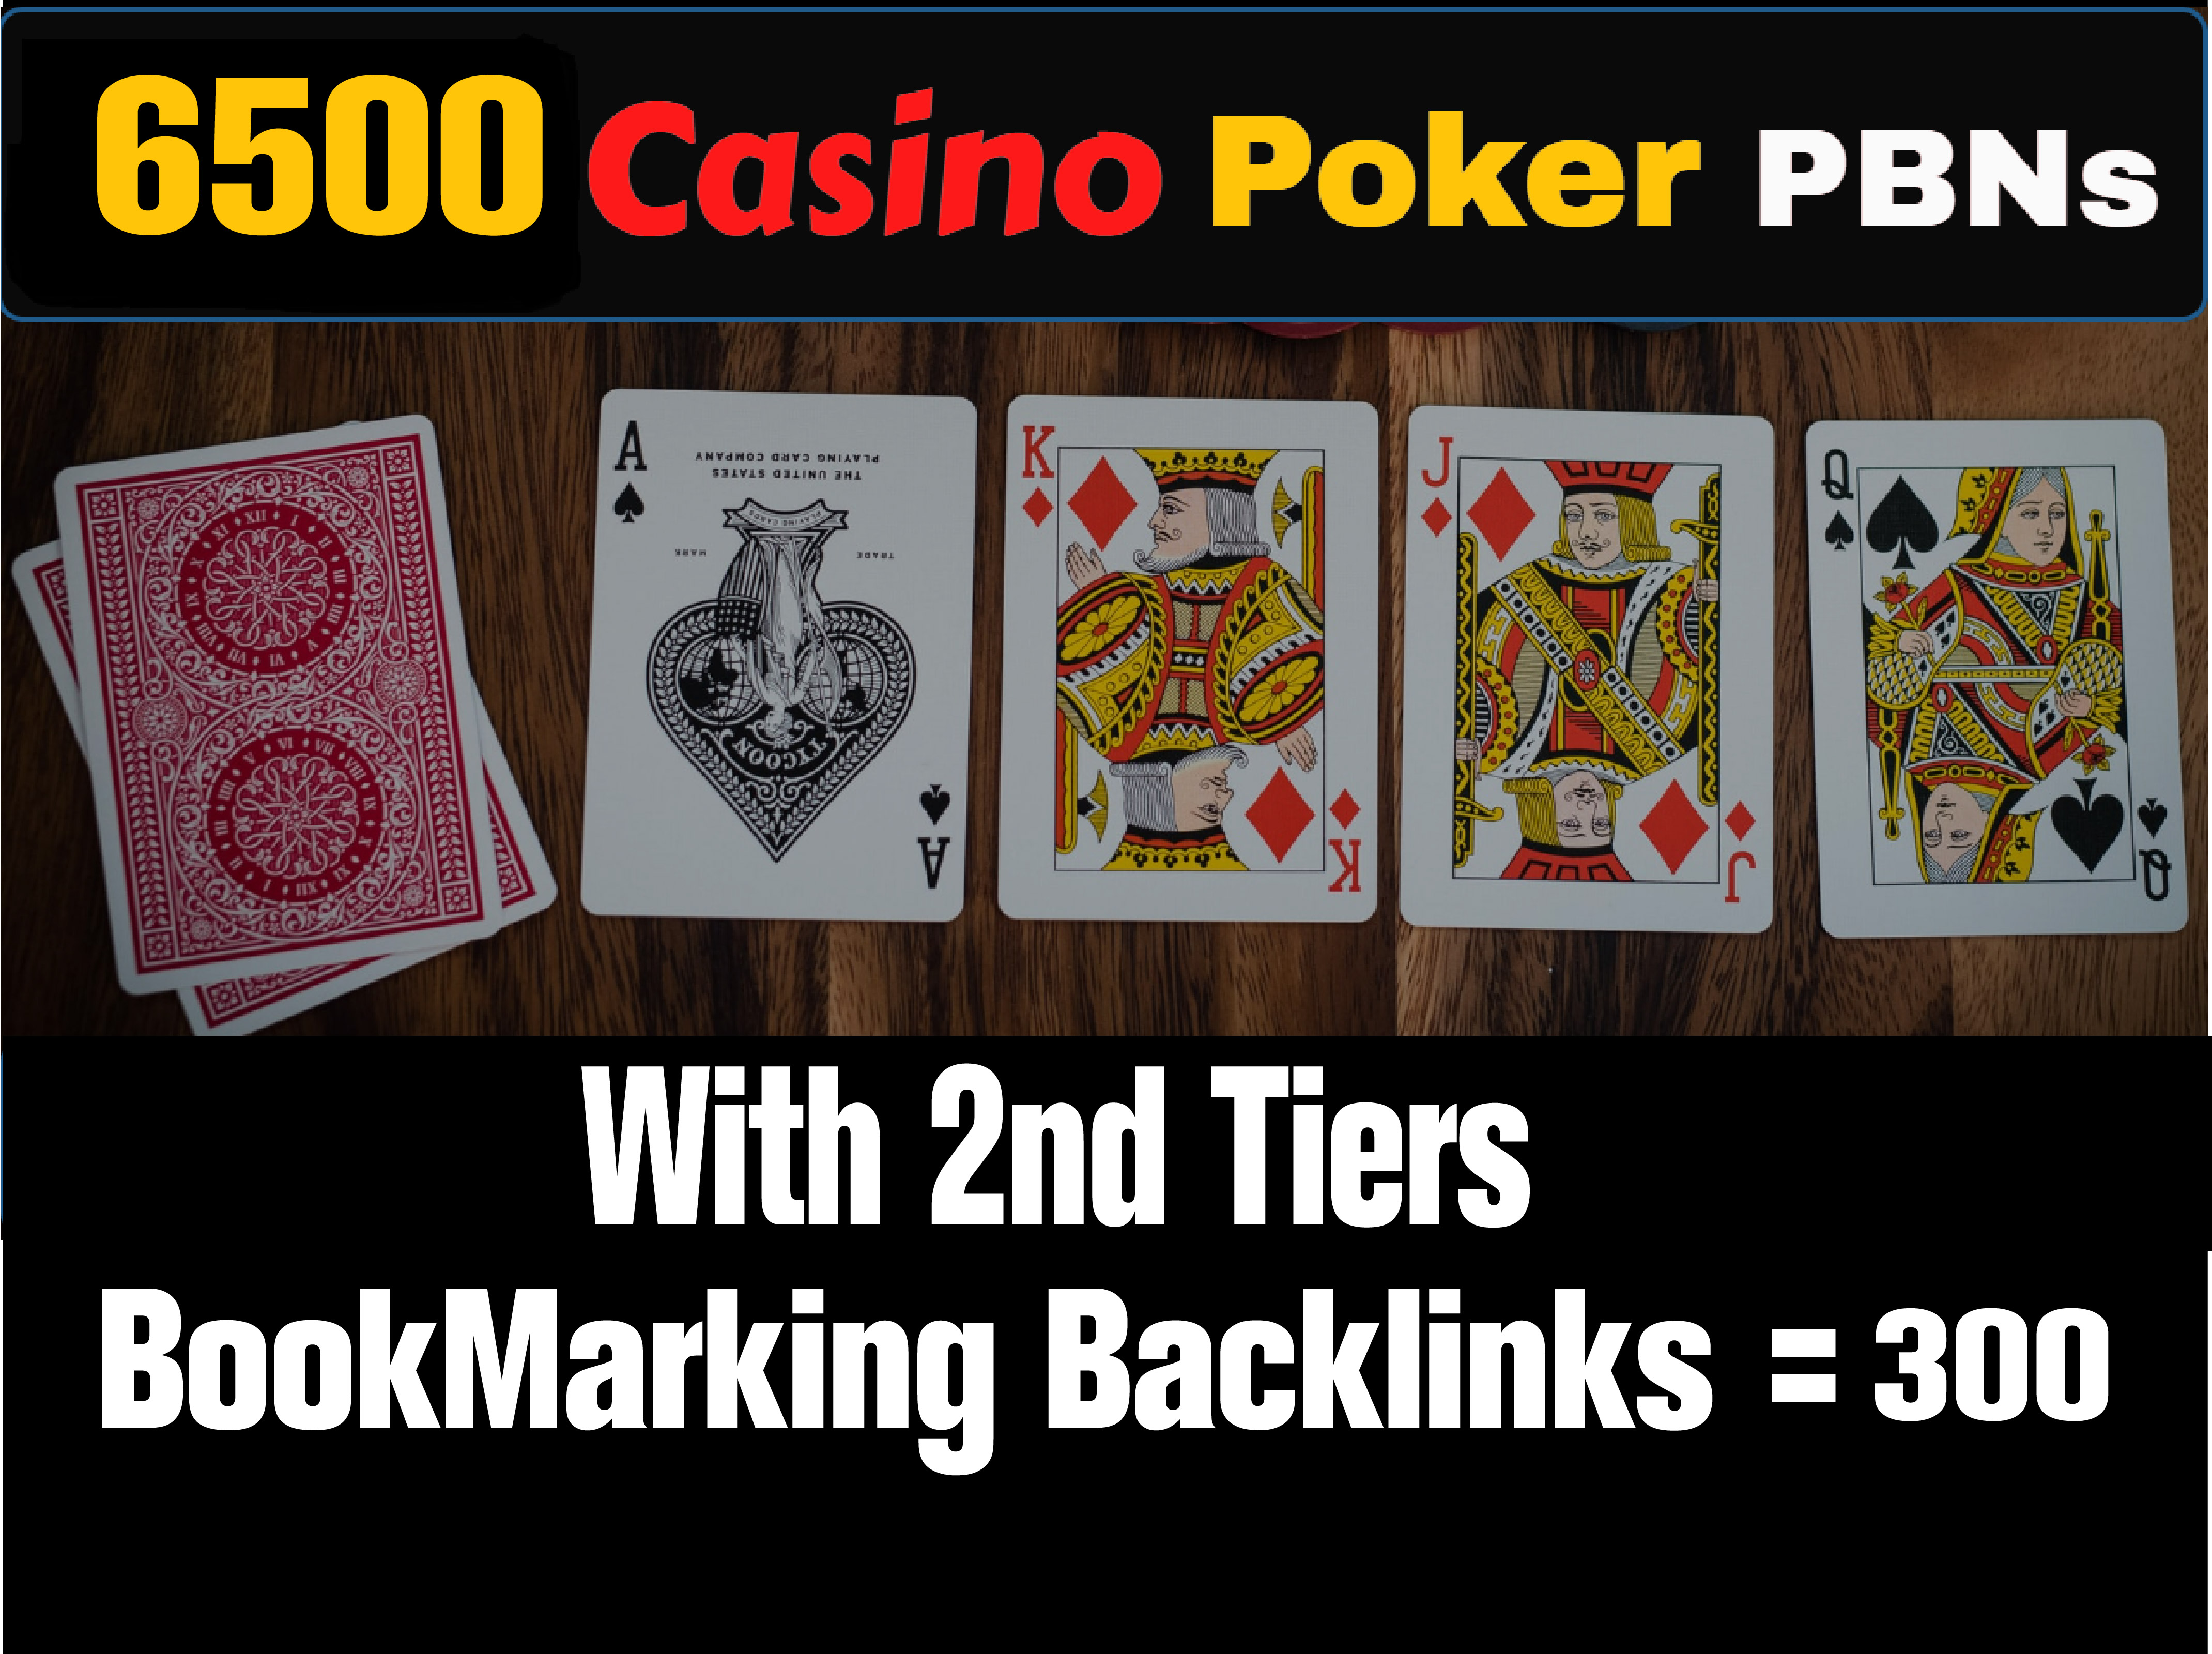 Create 6500 Homepage Gambling Casino Poker High DA/PA PBNs Post Backlinks Increase Your Website.